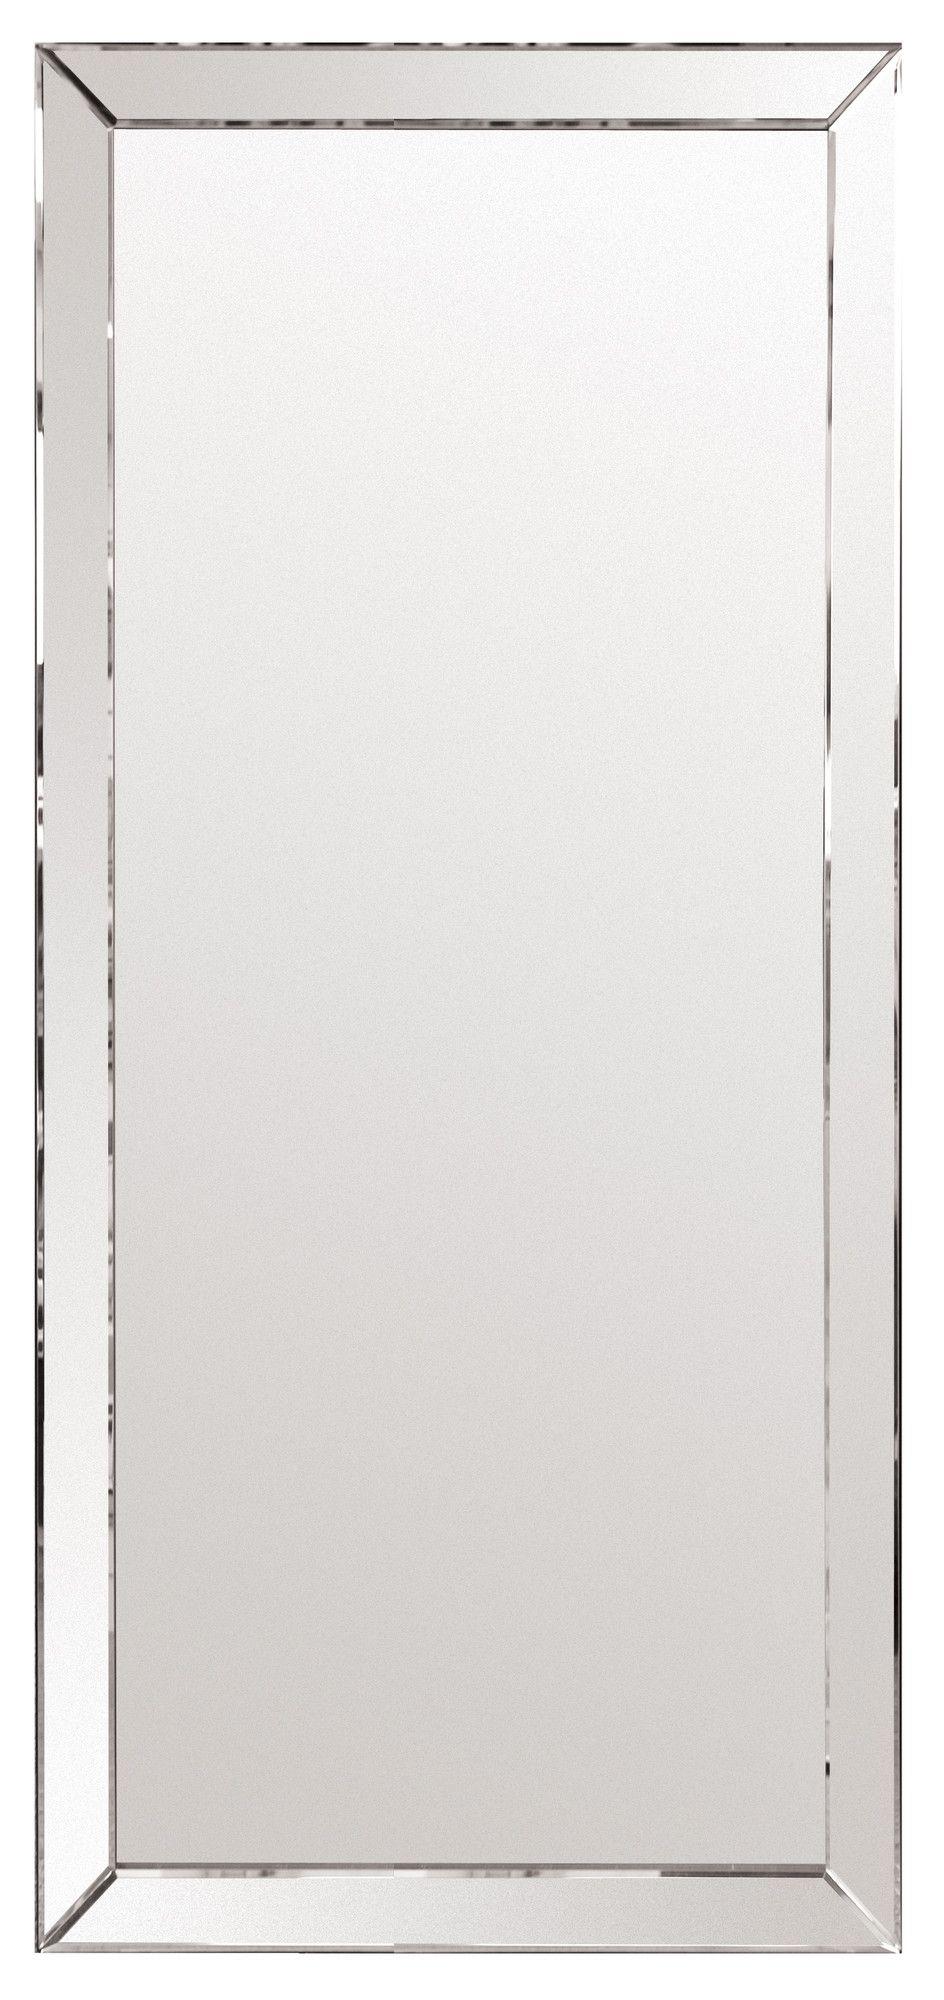 Erias Home Designs Luna Leaner Mirror & Reviews | Wayfair | Mirrors ...